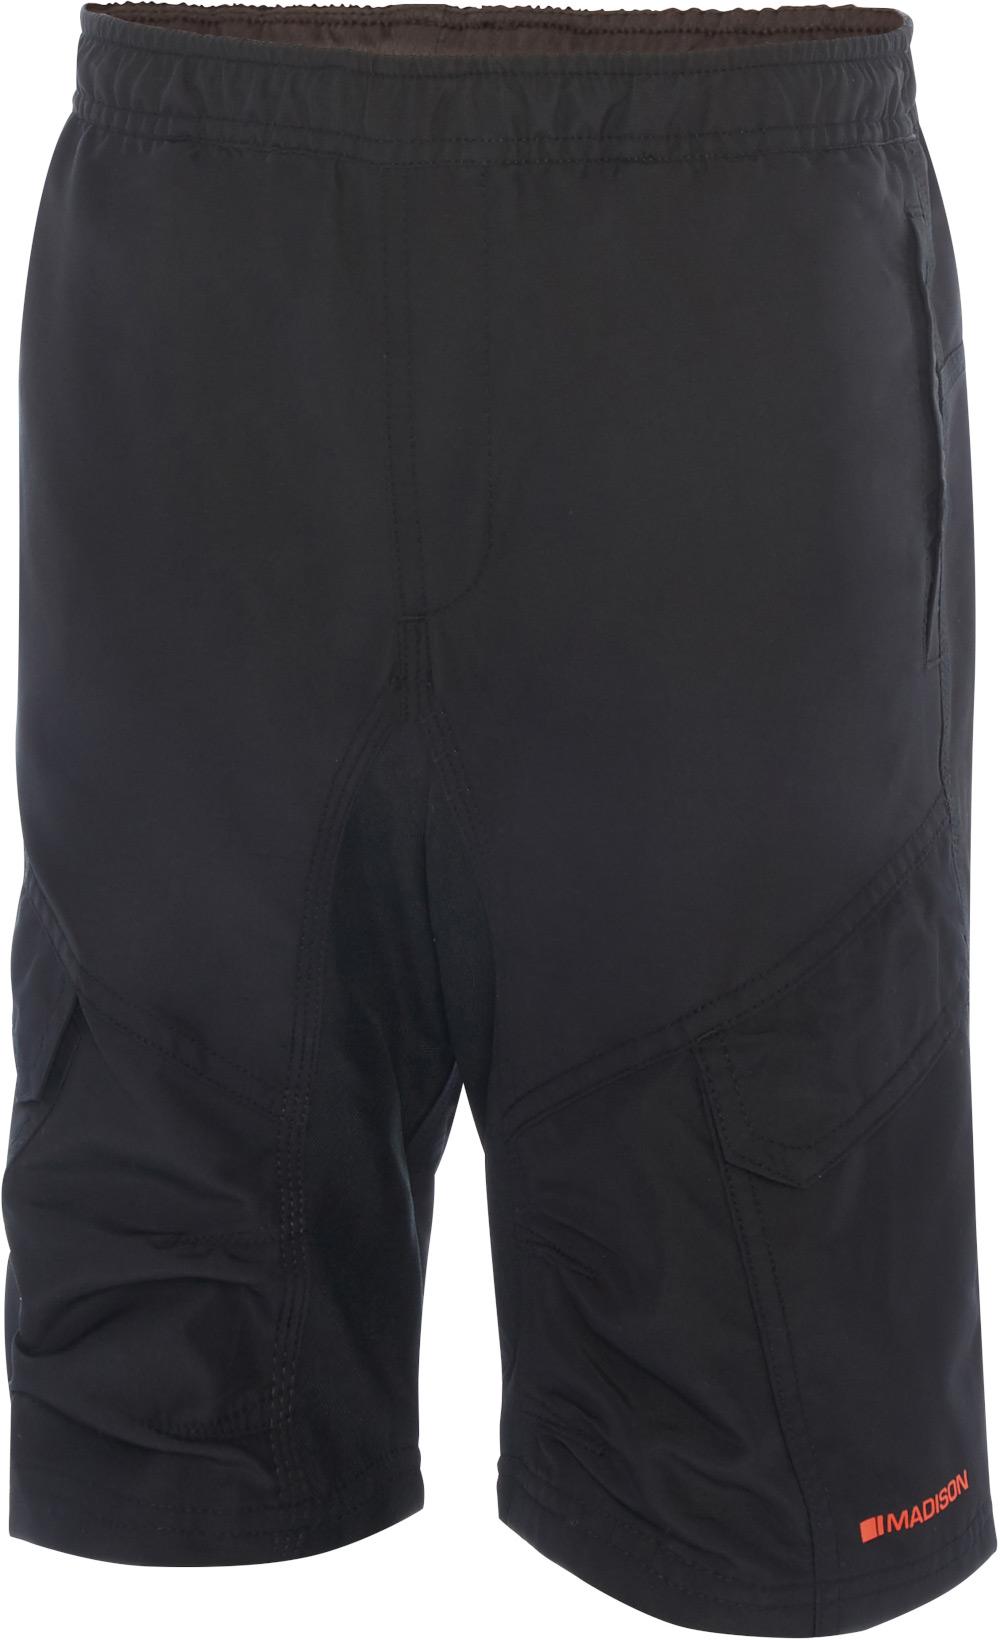 Madison - Trail | bike pants